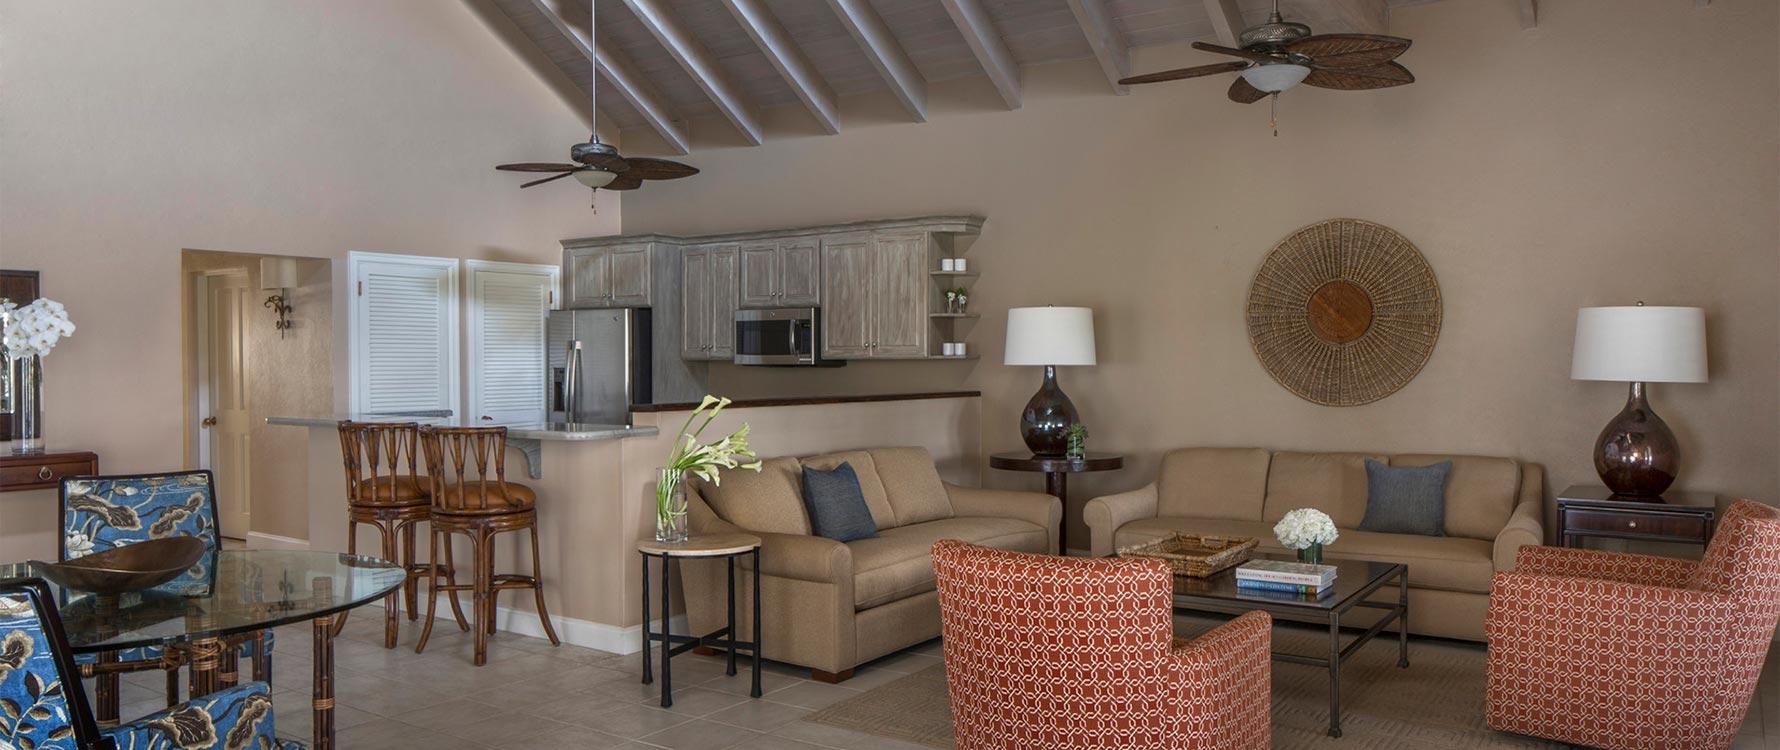 Living room/kitchen/dining-bar